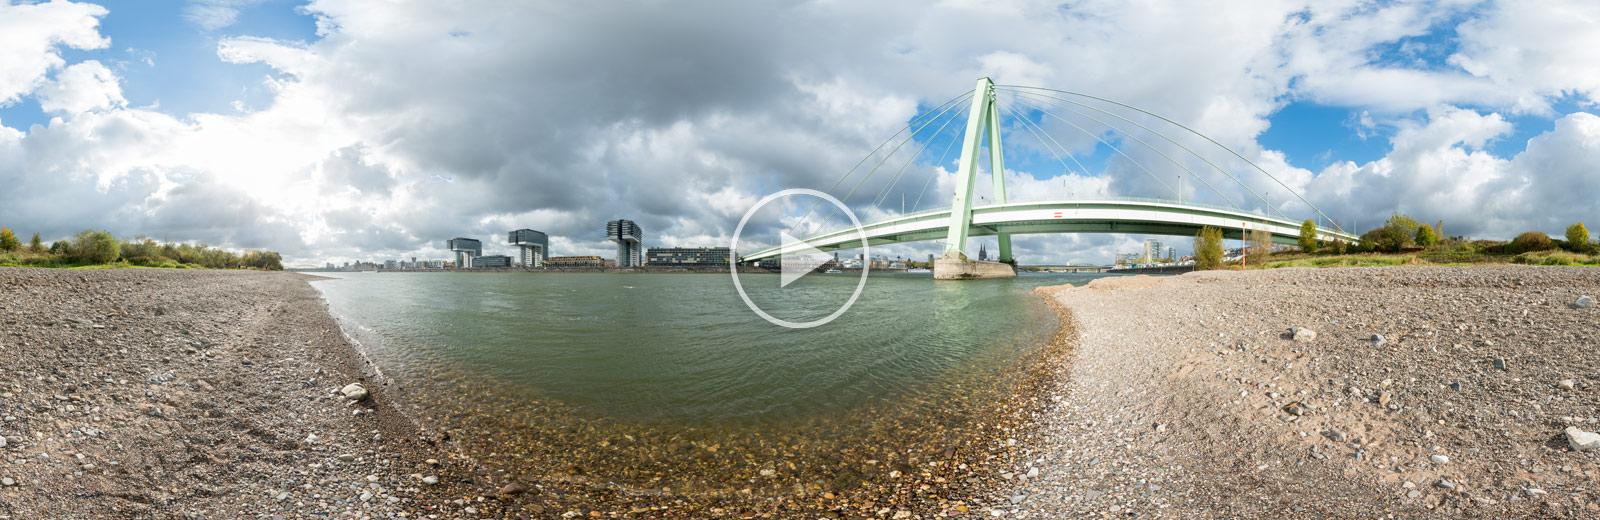 Rheinkilometer 687,2 – Severinsbrücke | 360°x180°-Panorama von Chris Witzani | 10.2017